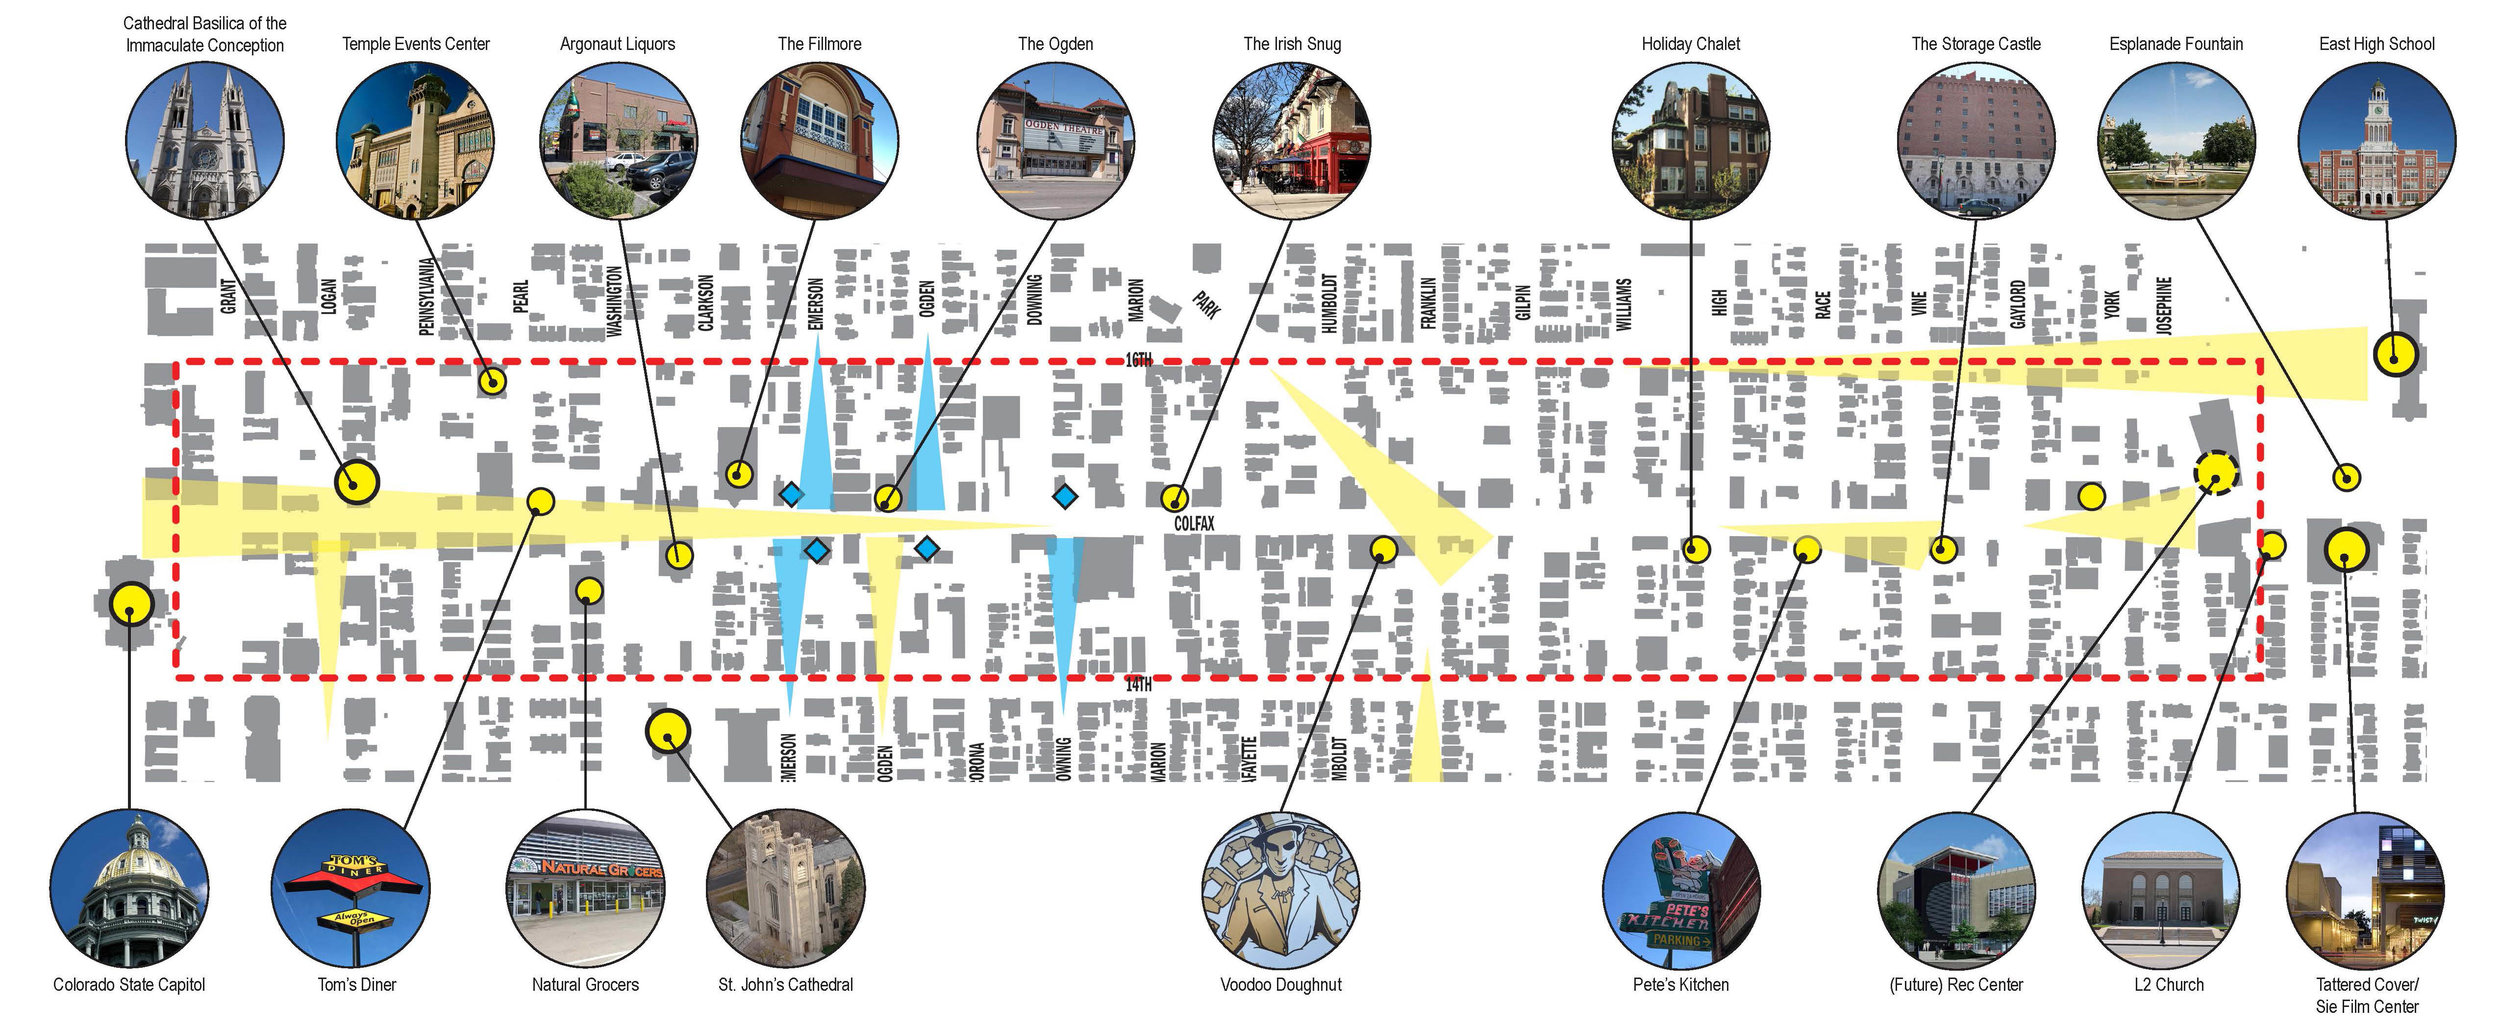 "<img src=""  studioINSITE_E_Colfax_Streetscape_Subareas  ""alt=""Streetscape Design, Master Plan, catalyst Project, Funding Plan, Phasing Plan, Public Outreach, BID, Bus Rapid Transit, Complete Streets, Streetscape Guidlines, Signage and Wayfinding, Public Art, Community Gateways, Landscape Architecture, Urban Design  "" title=""Colfax Avenue Streetscape Design Master Plan  ""/>"